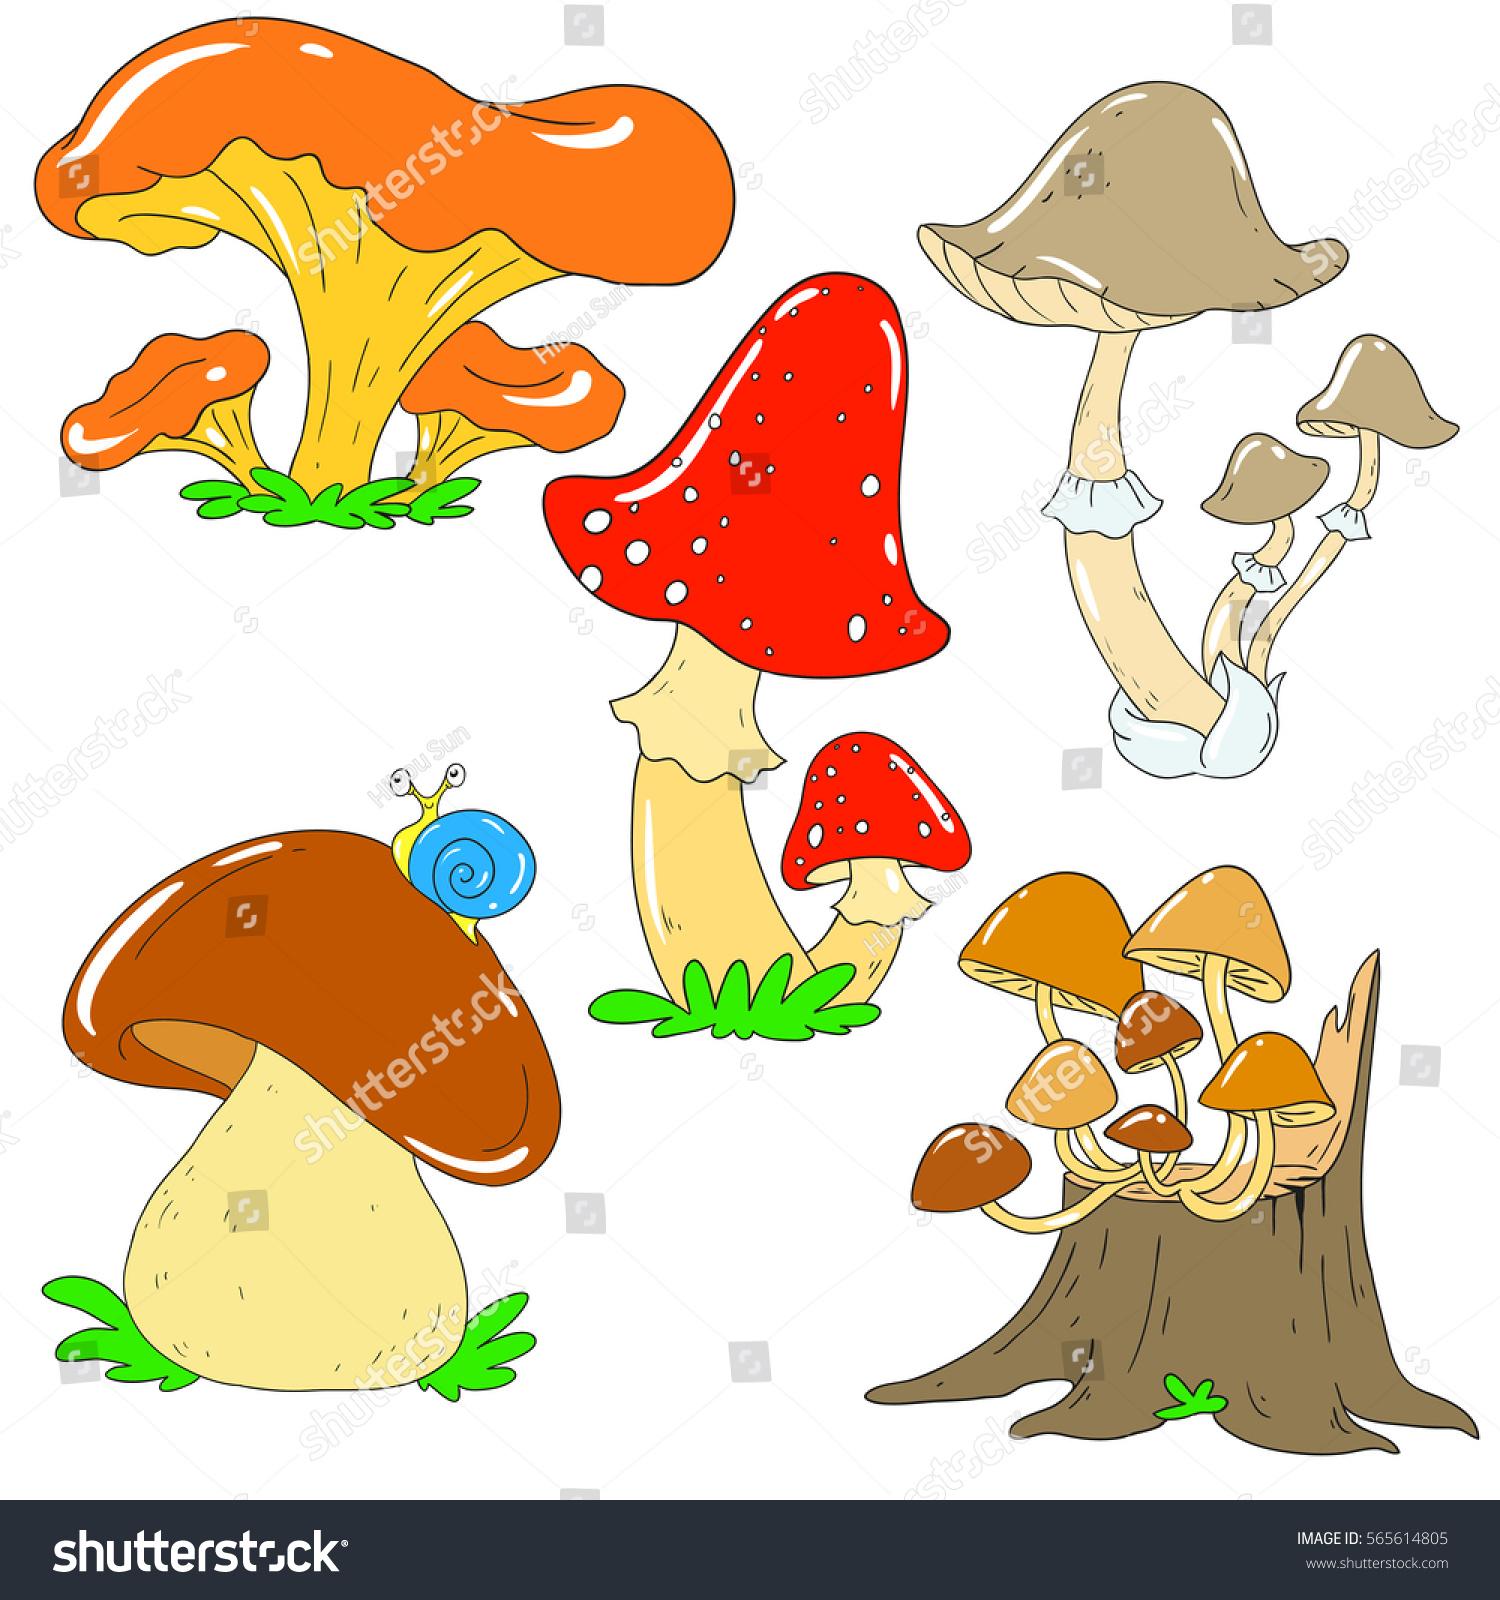 Collection of forest mushrooms. Chanterelle mushroom toadstool white fungus. Mycelium Vector  sc 1 st  Shutterstock & Collection Forest Mushrooms Chanterelle Mushroom Toadstool Stock ... islam-shia.org